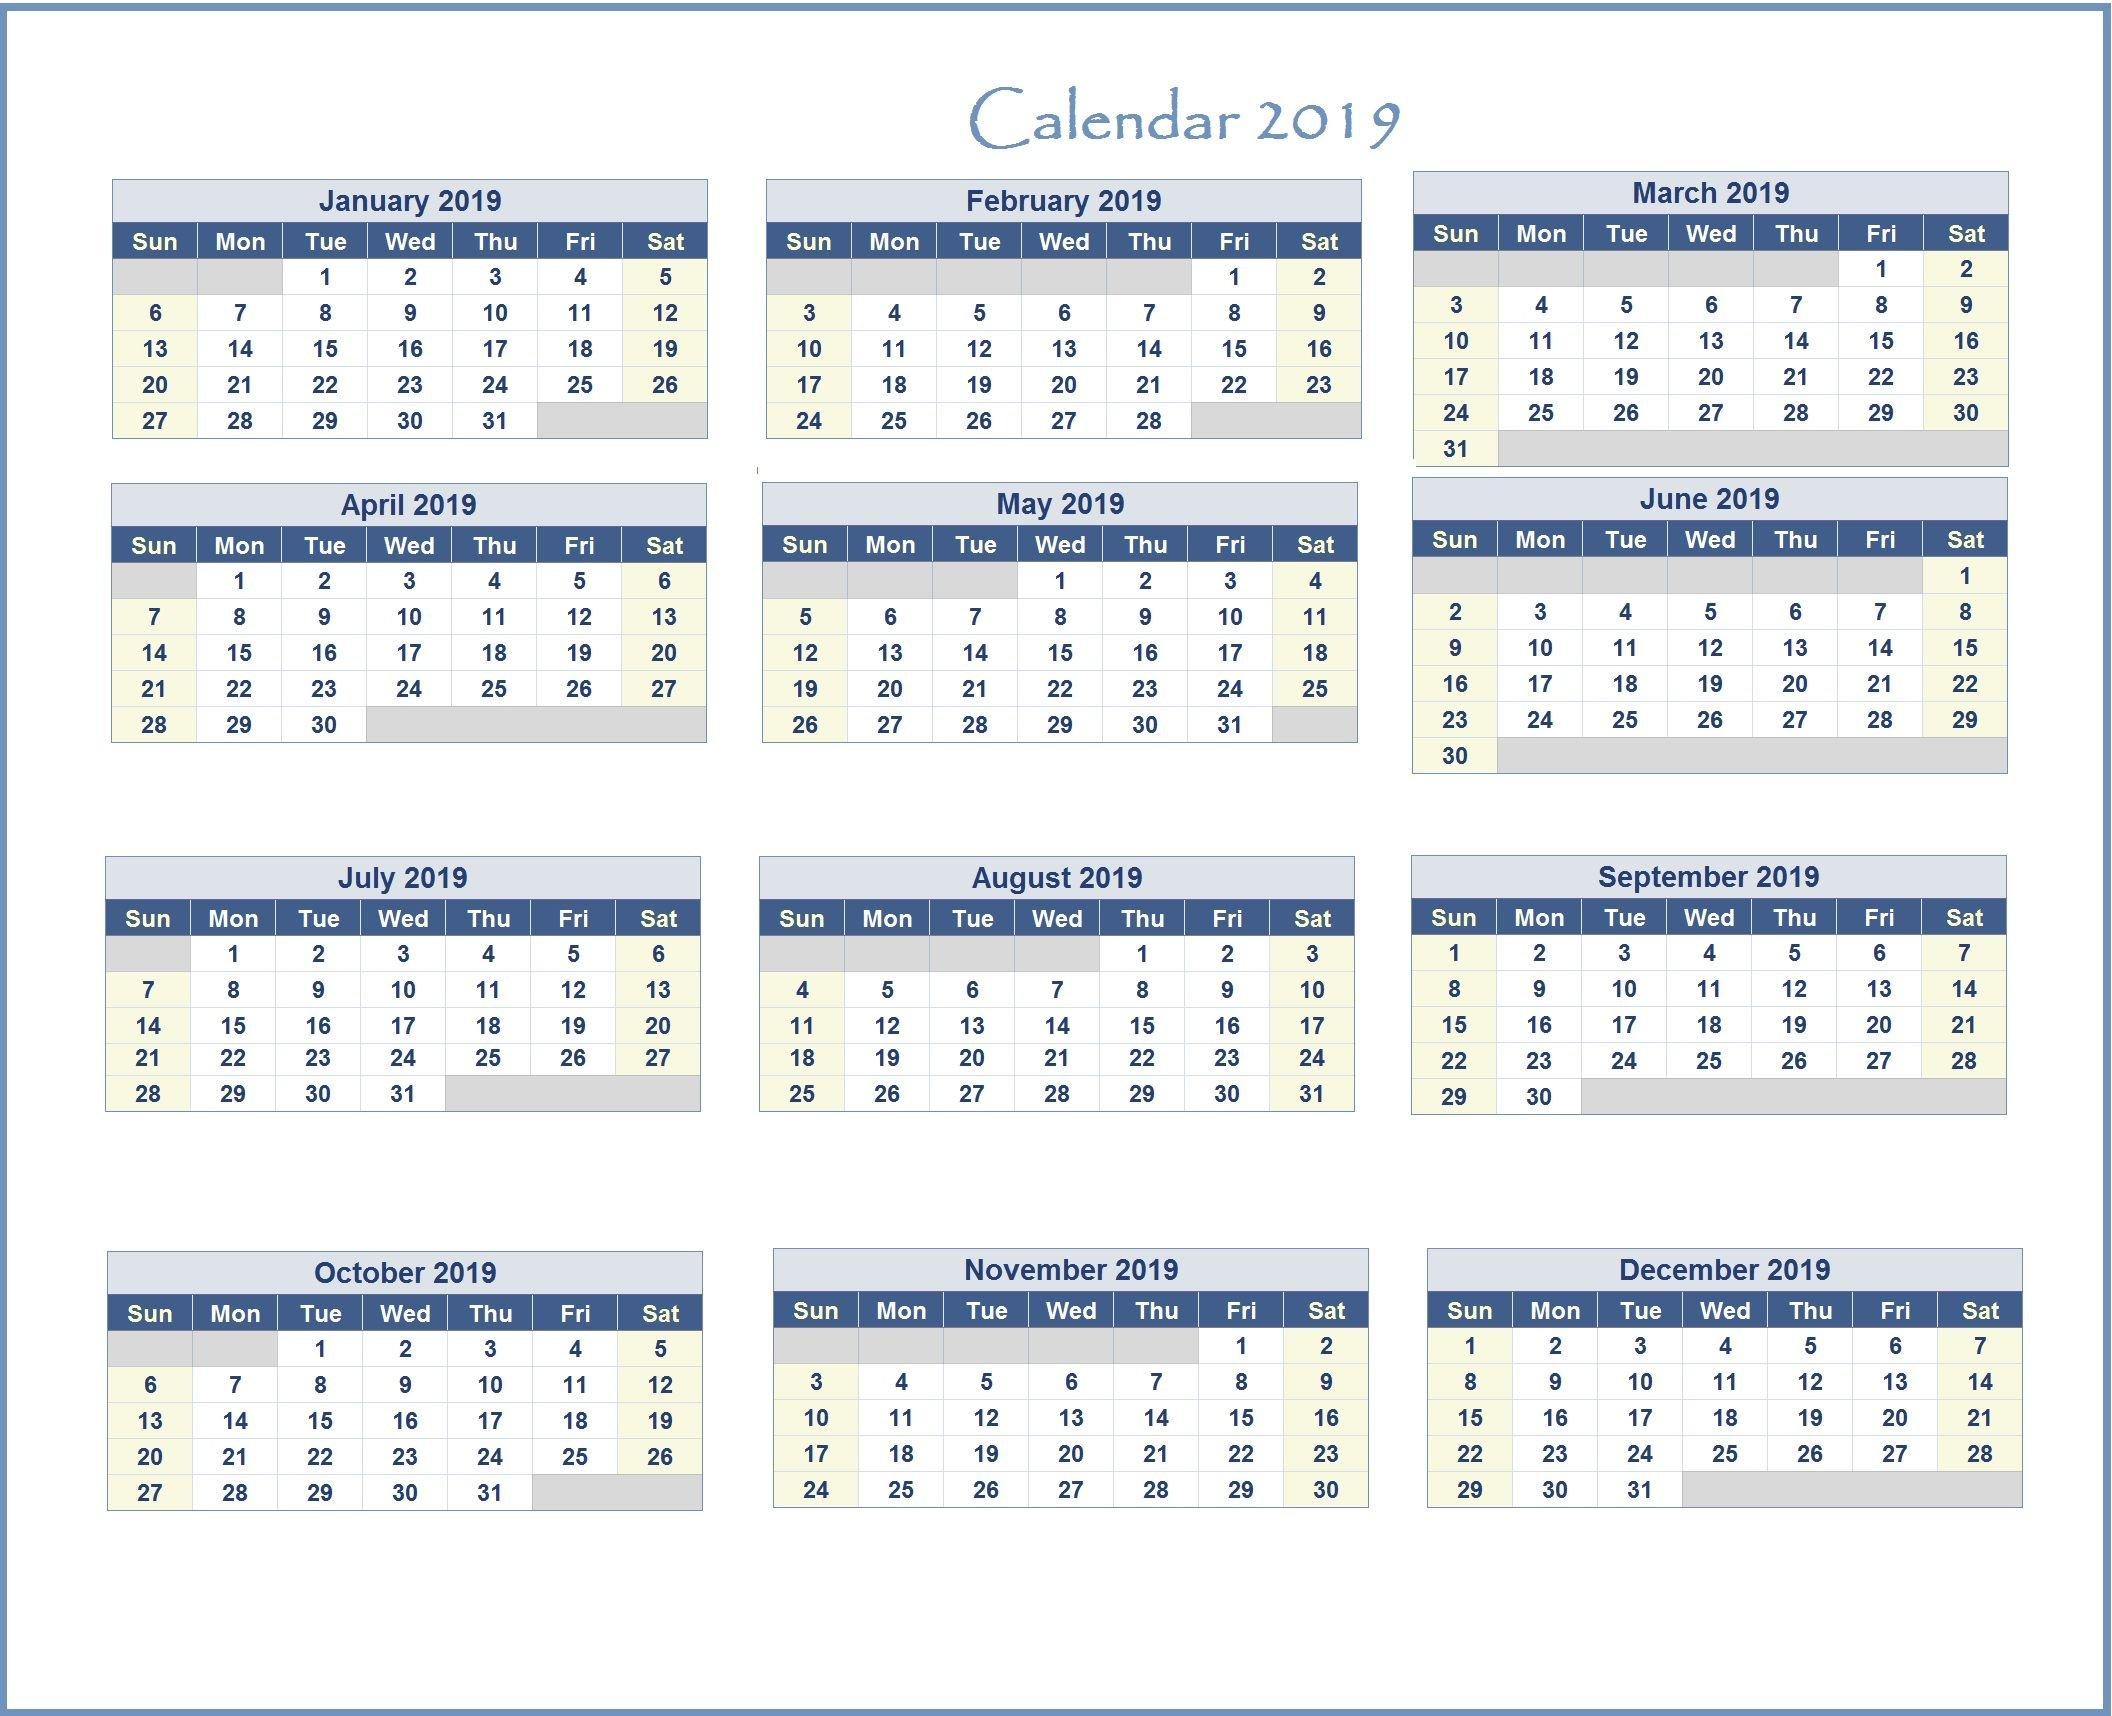 2019 Excel Calendar | Monthly Calendar Templates | Excel Calendar Calendar 2019 In Excel